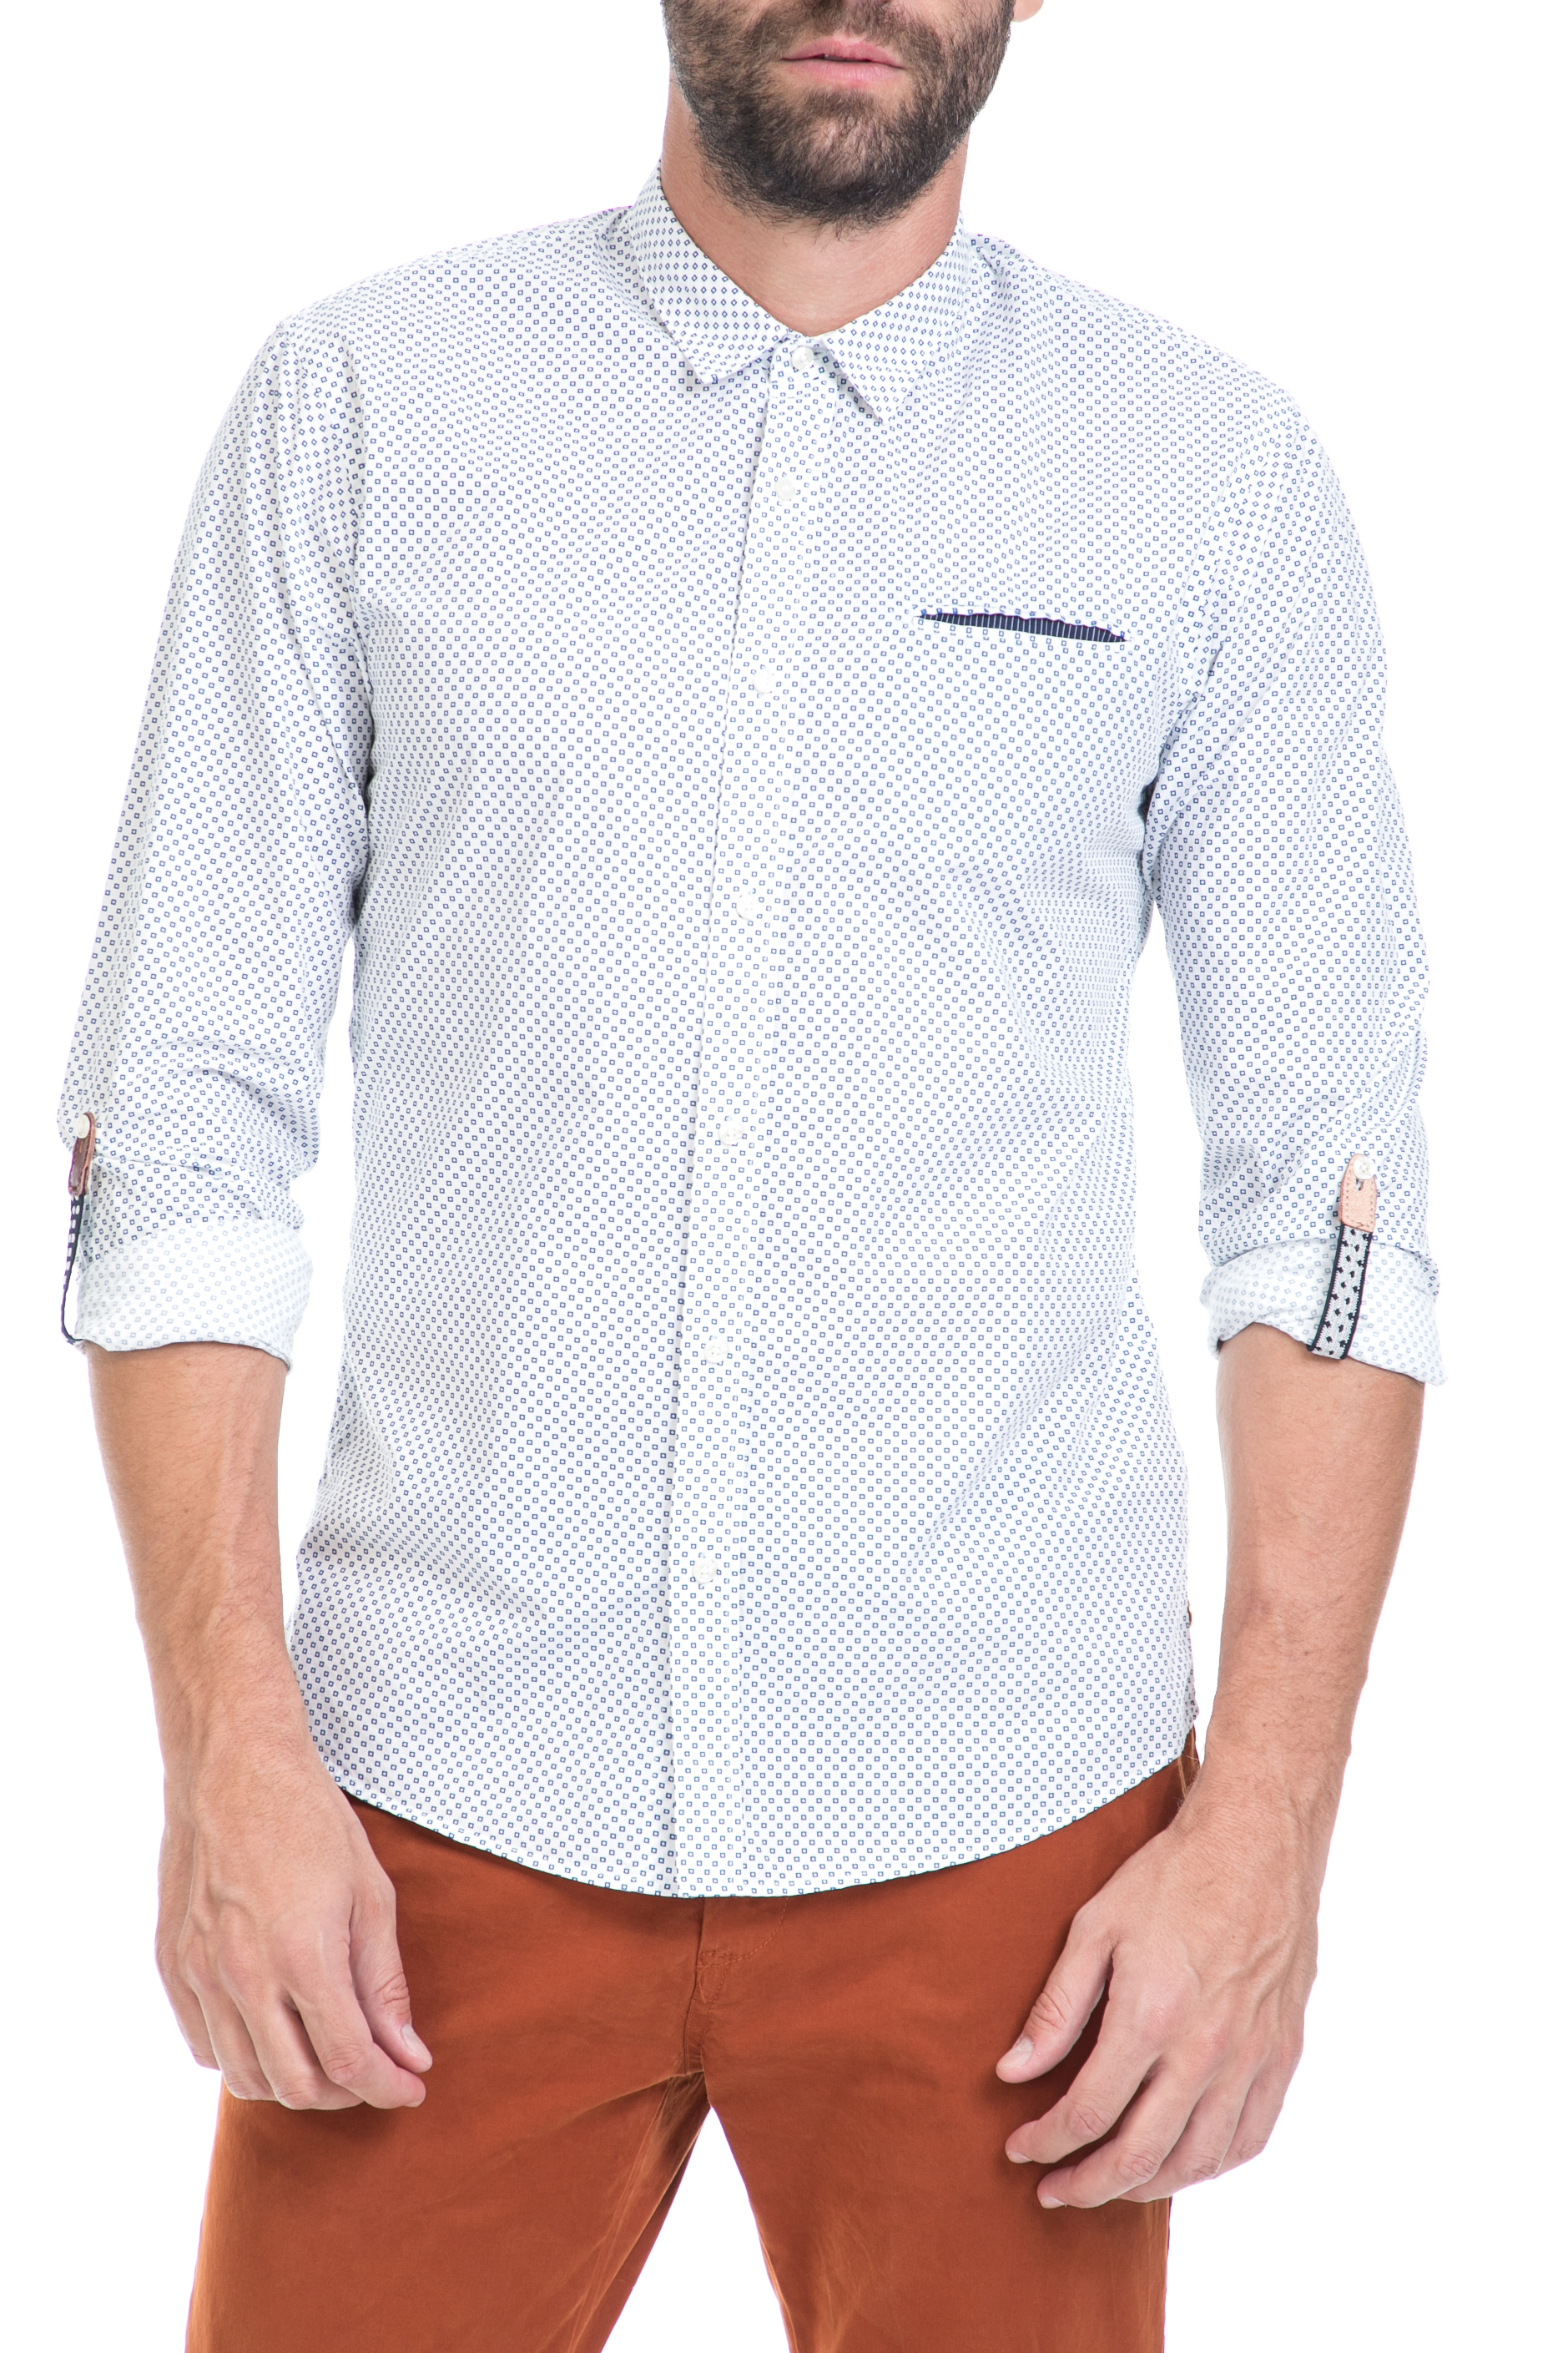 SCOTCH & SODA - Ανδρικό πουκάμισο SCOTCH & SODA λευκό- μπλε ανδρικά ρούχα πουκάμισα μακρυμάνικα